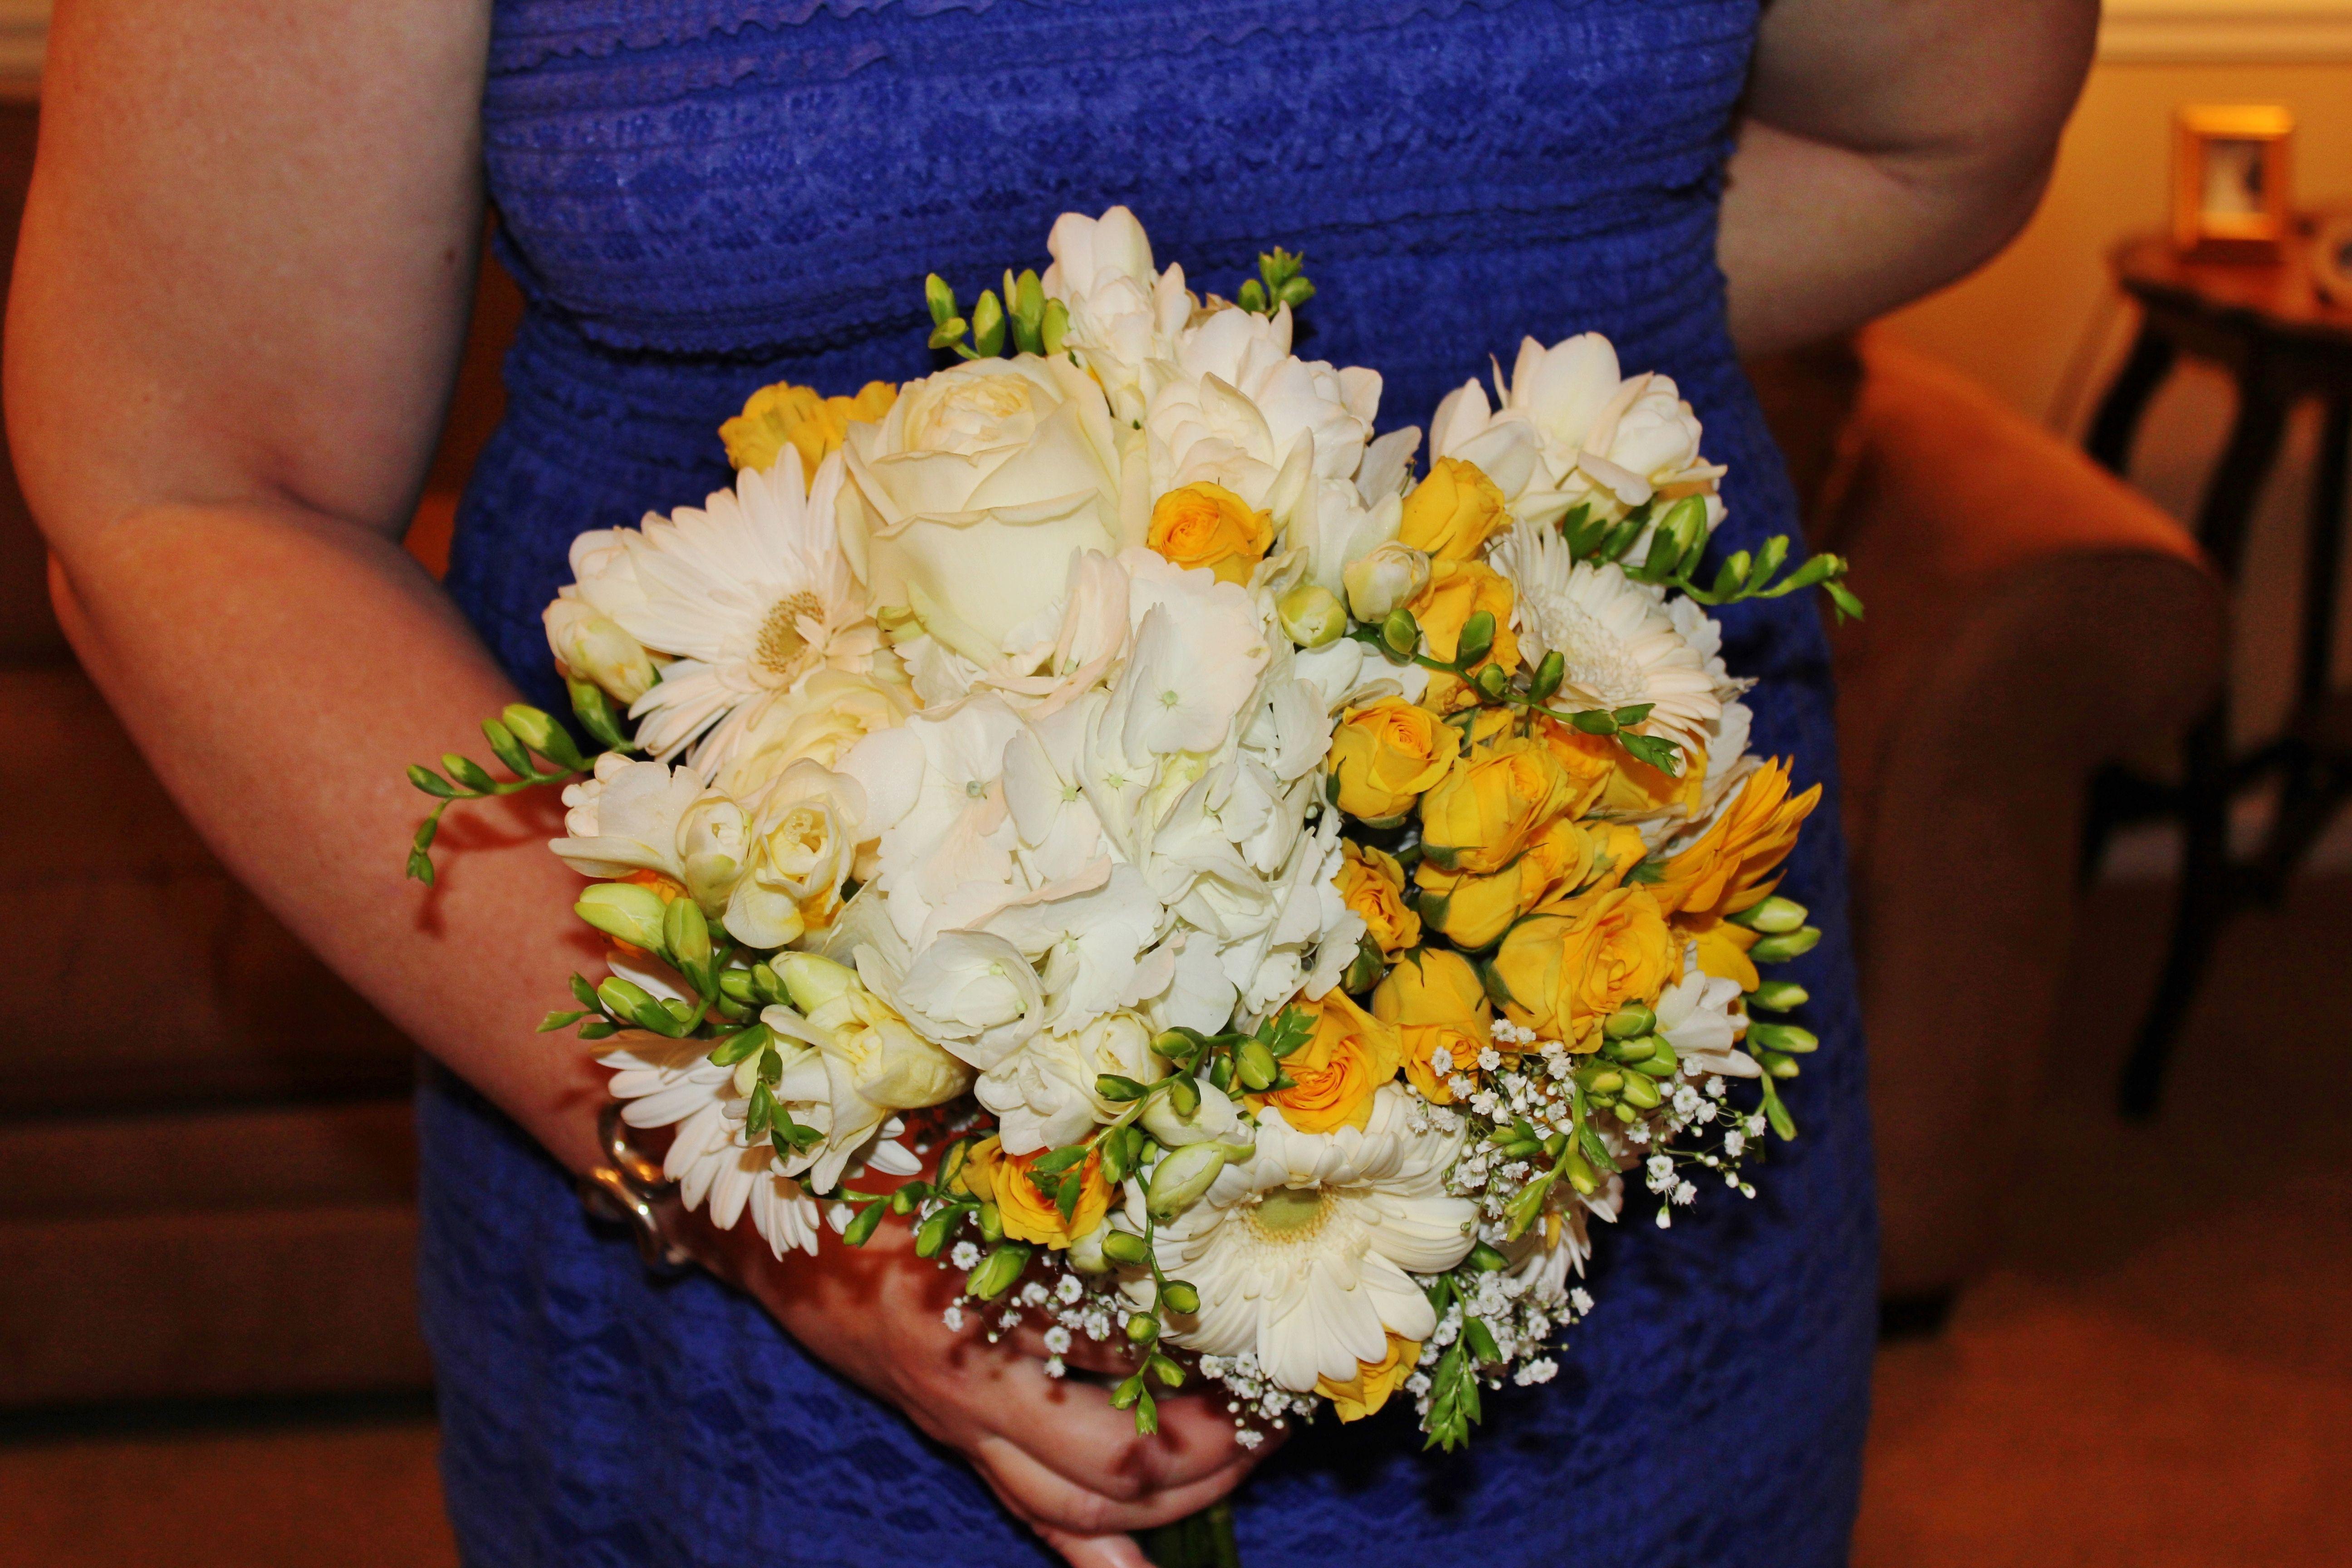 White and yellow bridal bouquet by Rockwall Wedding Chapel rockwallchapel.com